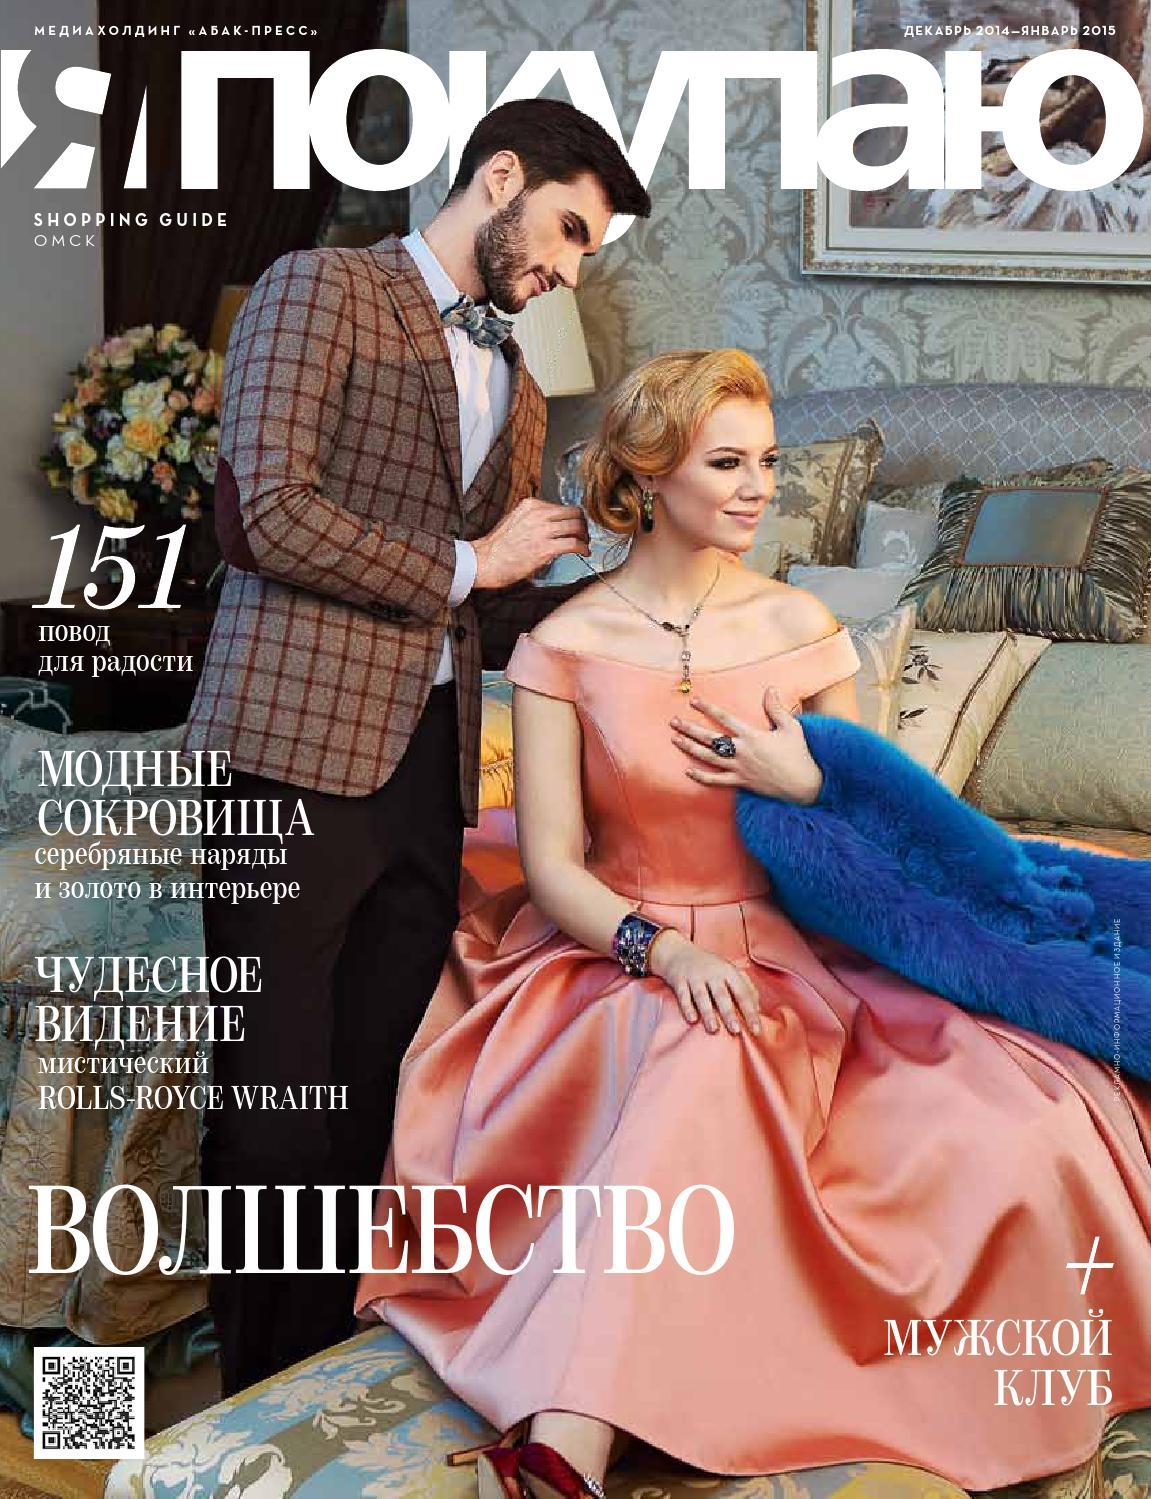 12efb63371d Shopping Guide «Я Покупаю.Омск» декабрь 2014 – январь 2015 by Shopping  Guide «Я Покупаю.Омск» - issuu